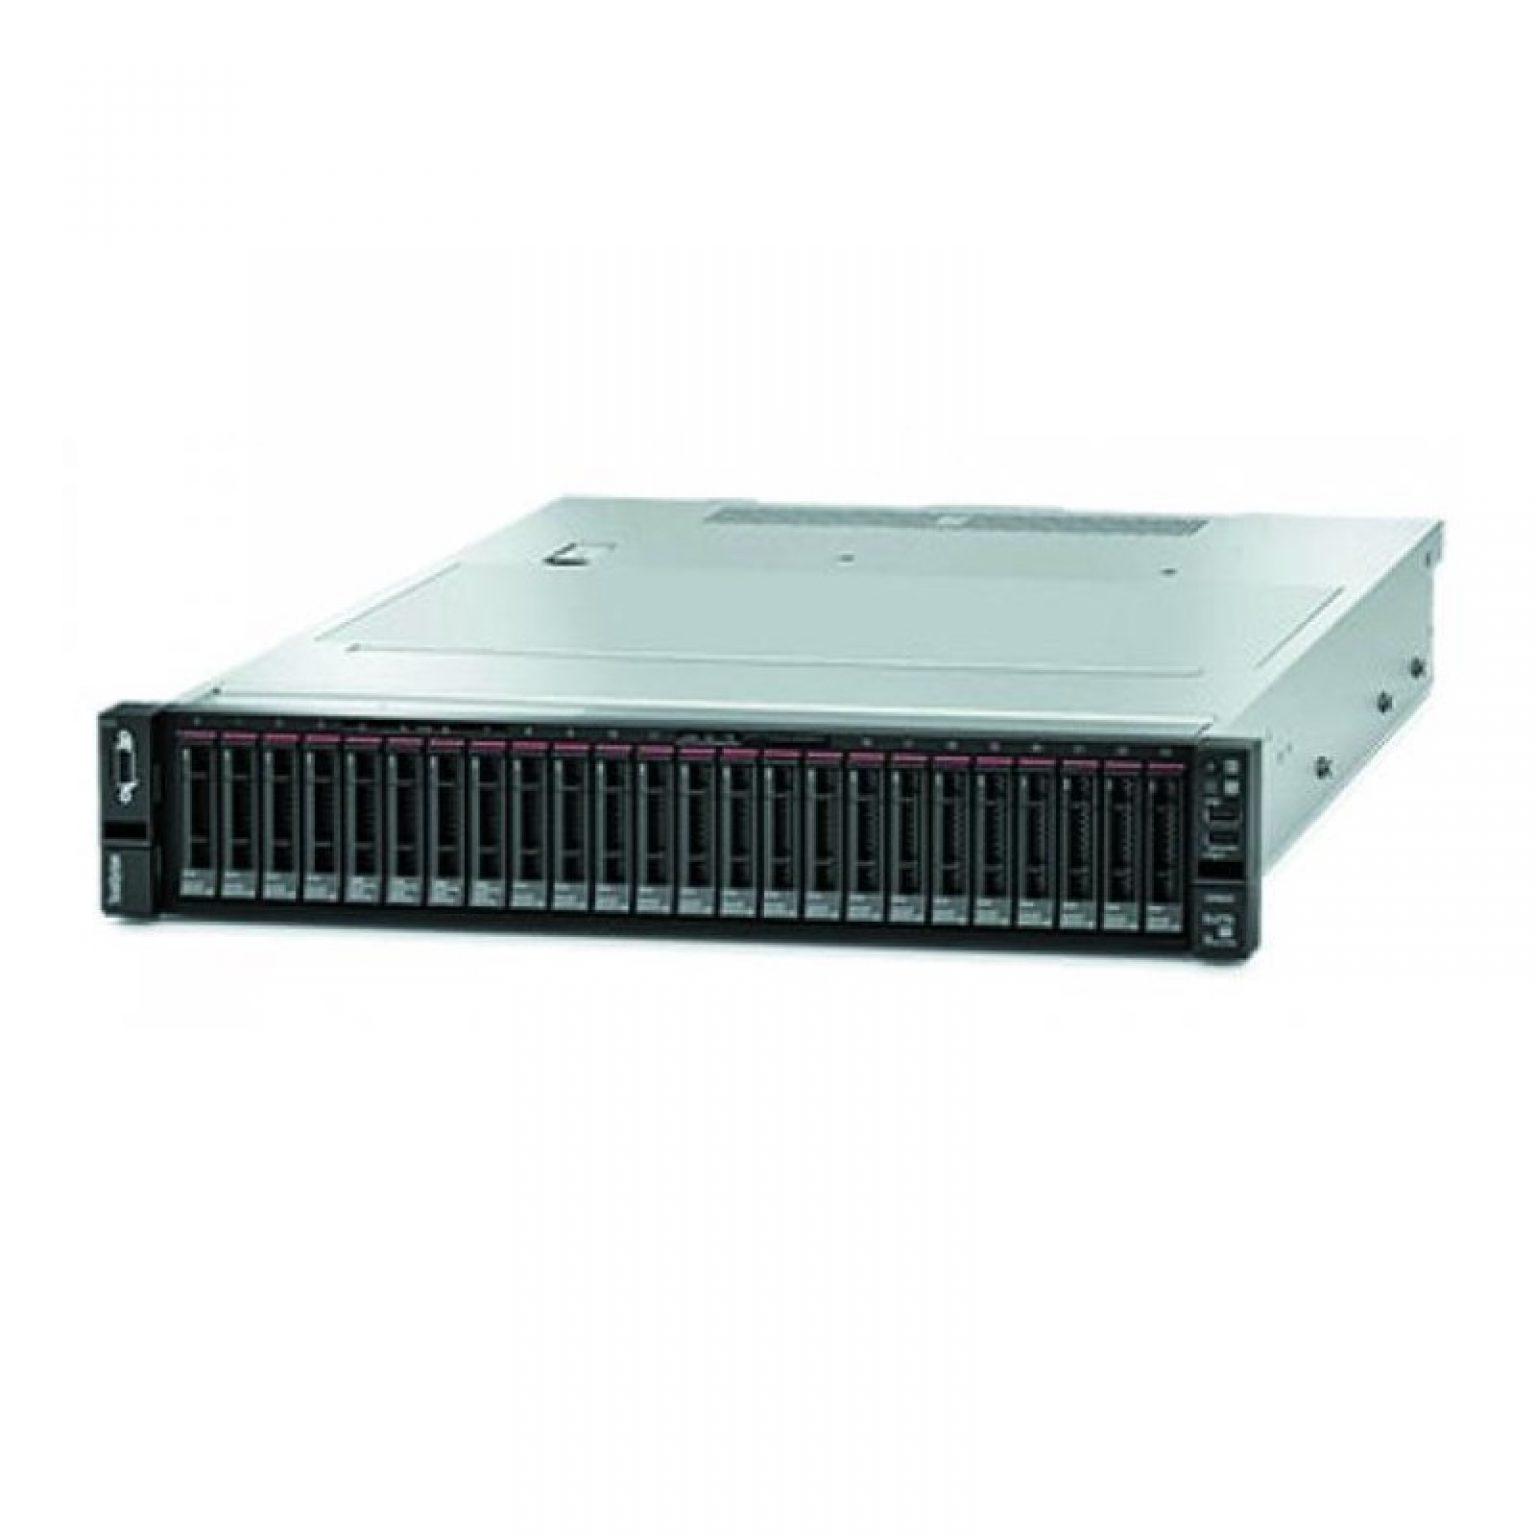 LENOVO - Thinksystem SR650 (2xGold 5218 16C 2.3GHz/RAM 8x32GB/HDD 8x2.4TB SAS/2x2750W)